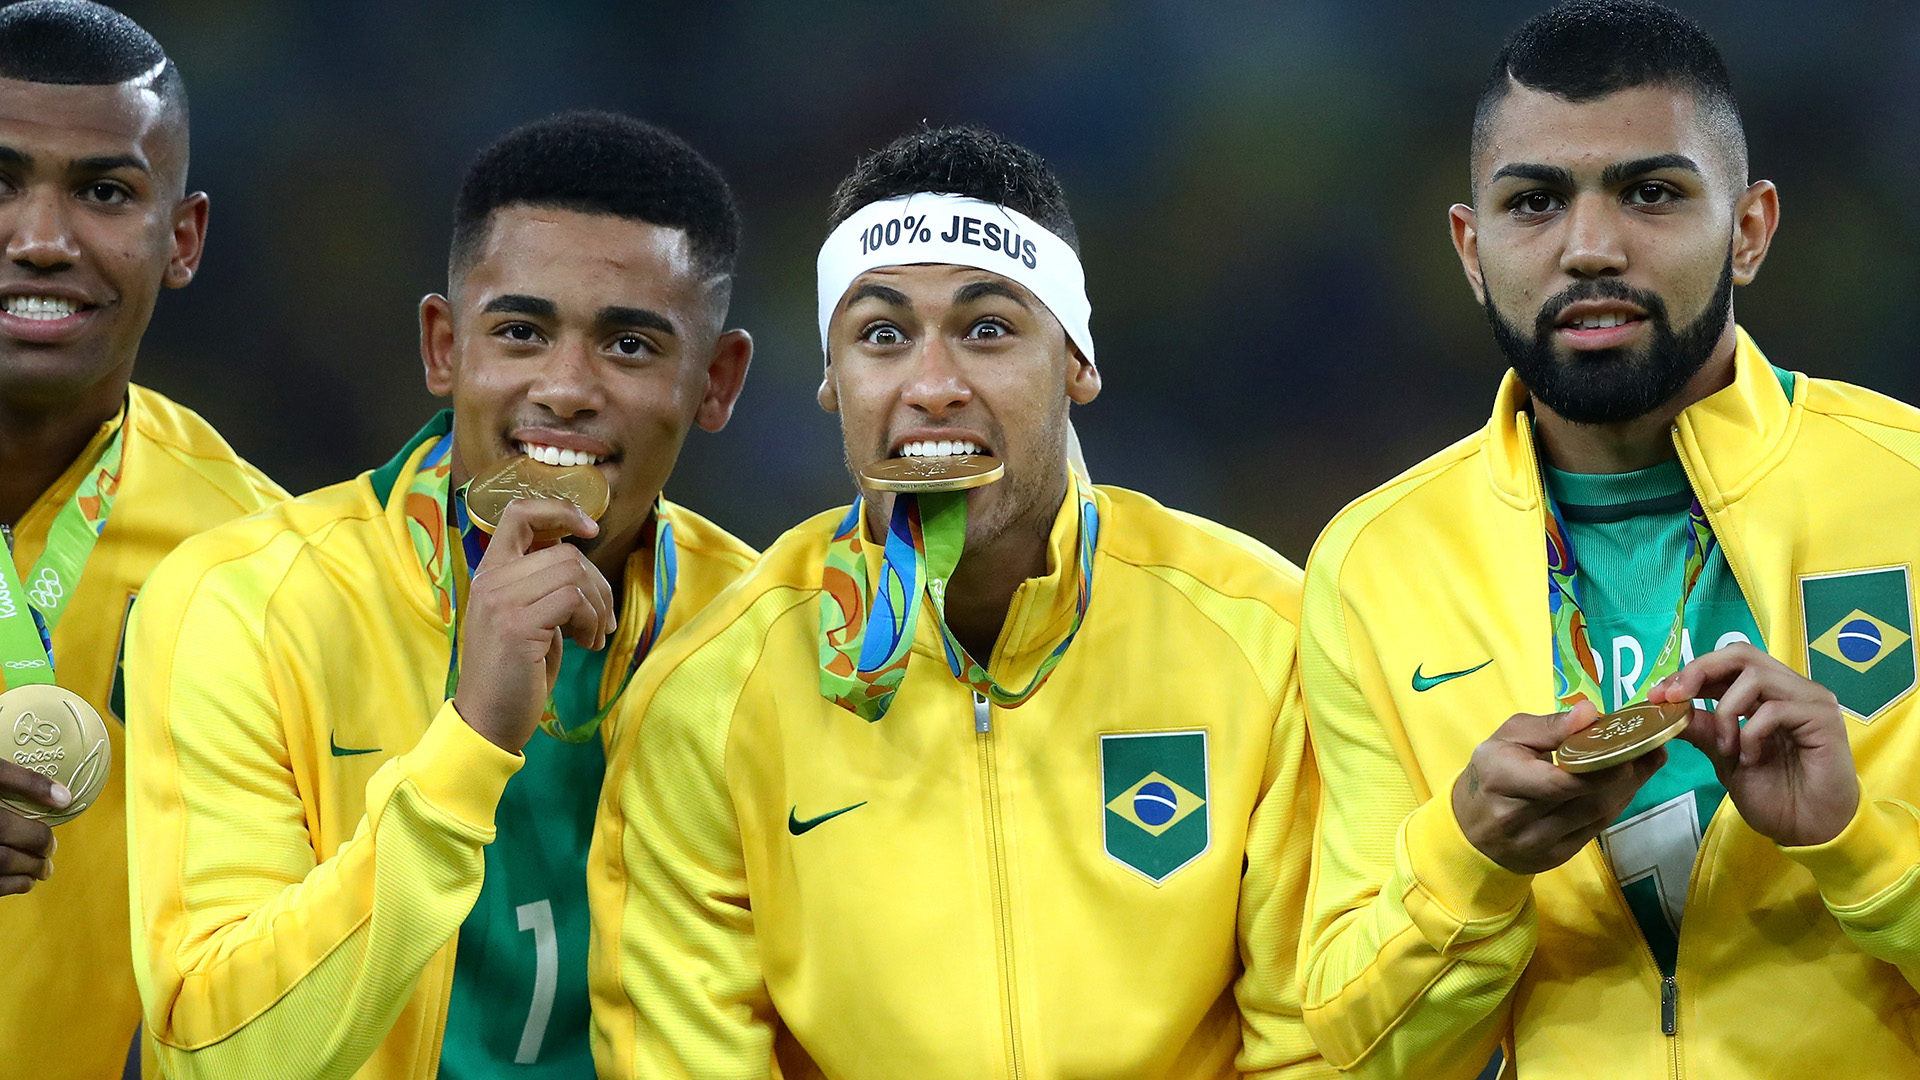 Neymar Gabriel Jesus Gabigol Brazil Gold Medal Rio 2016 Olympics